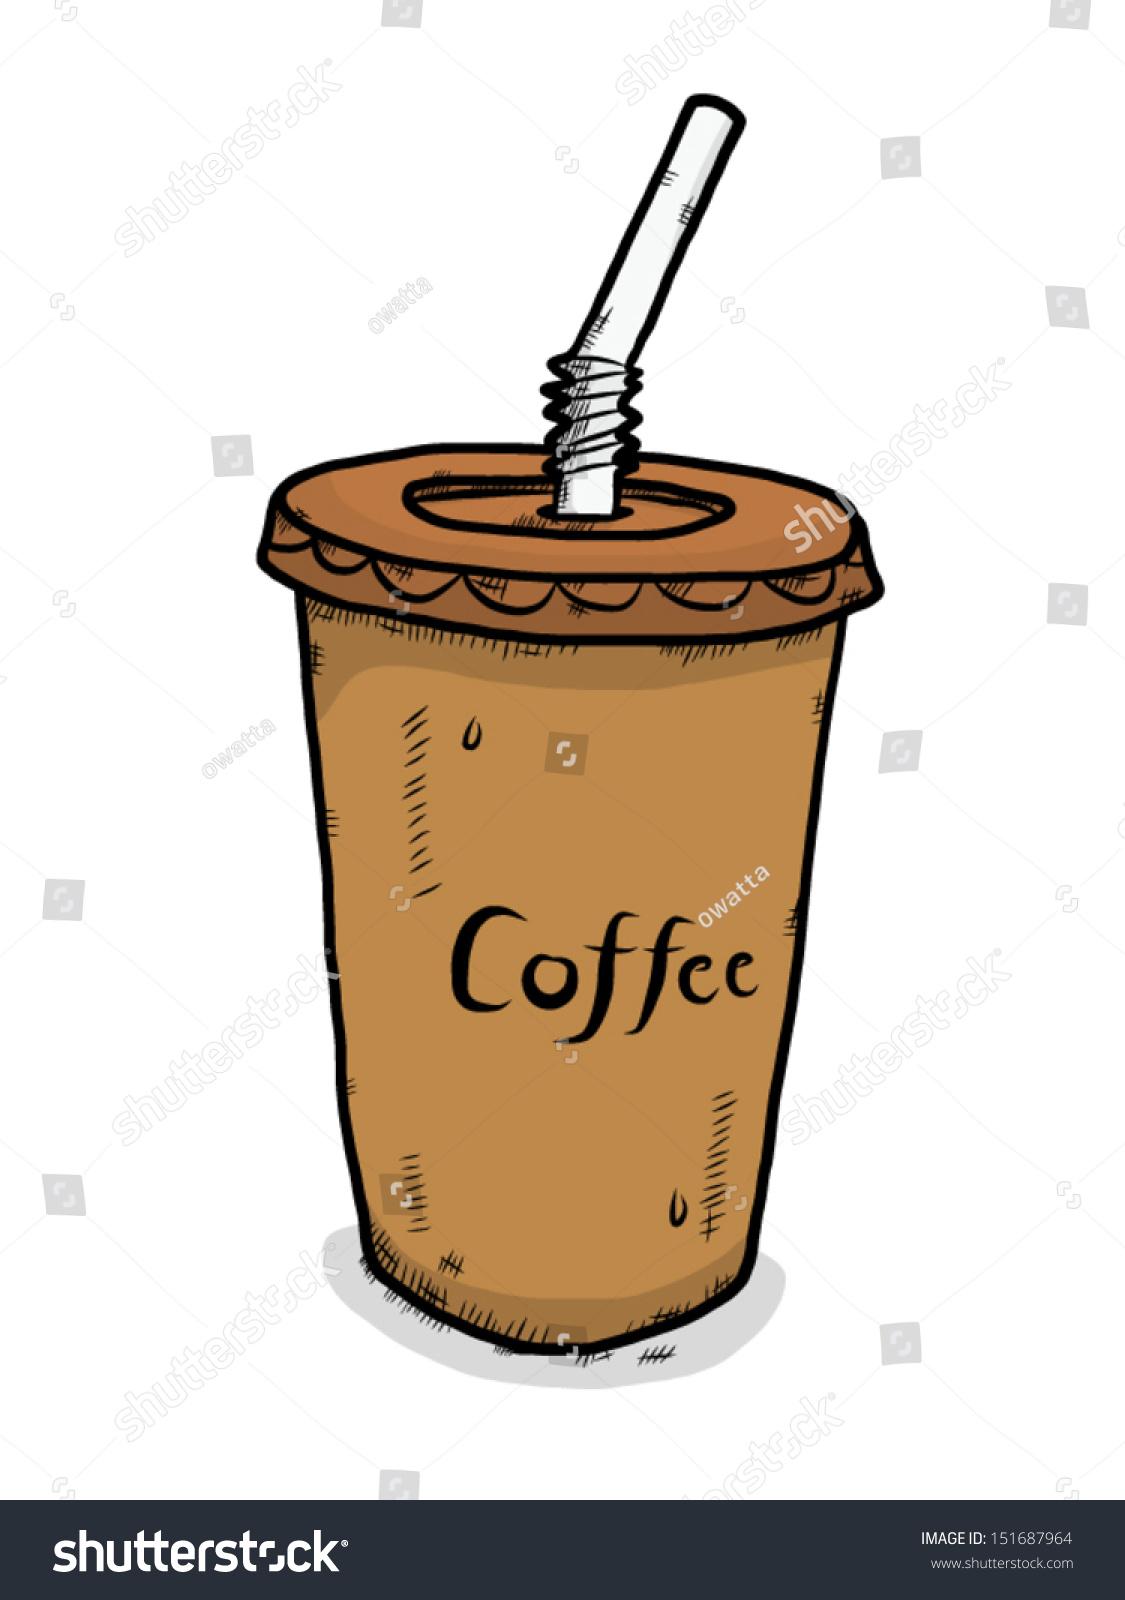 Cute Coffee Mug Wallpaper Ice Coffee Plastic Cup Cartoon Vector Stock Vector